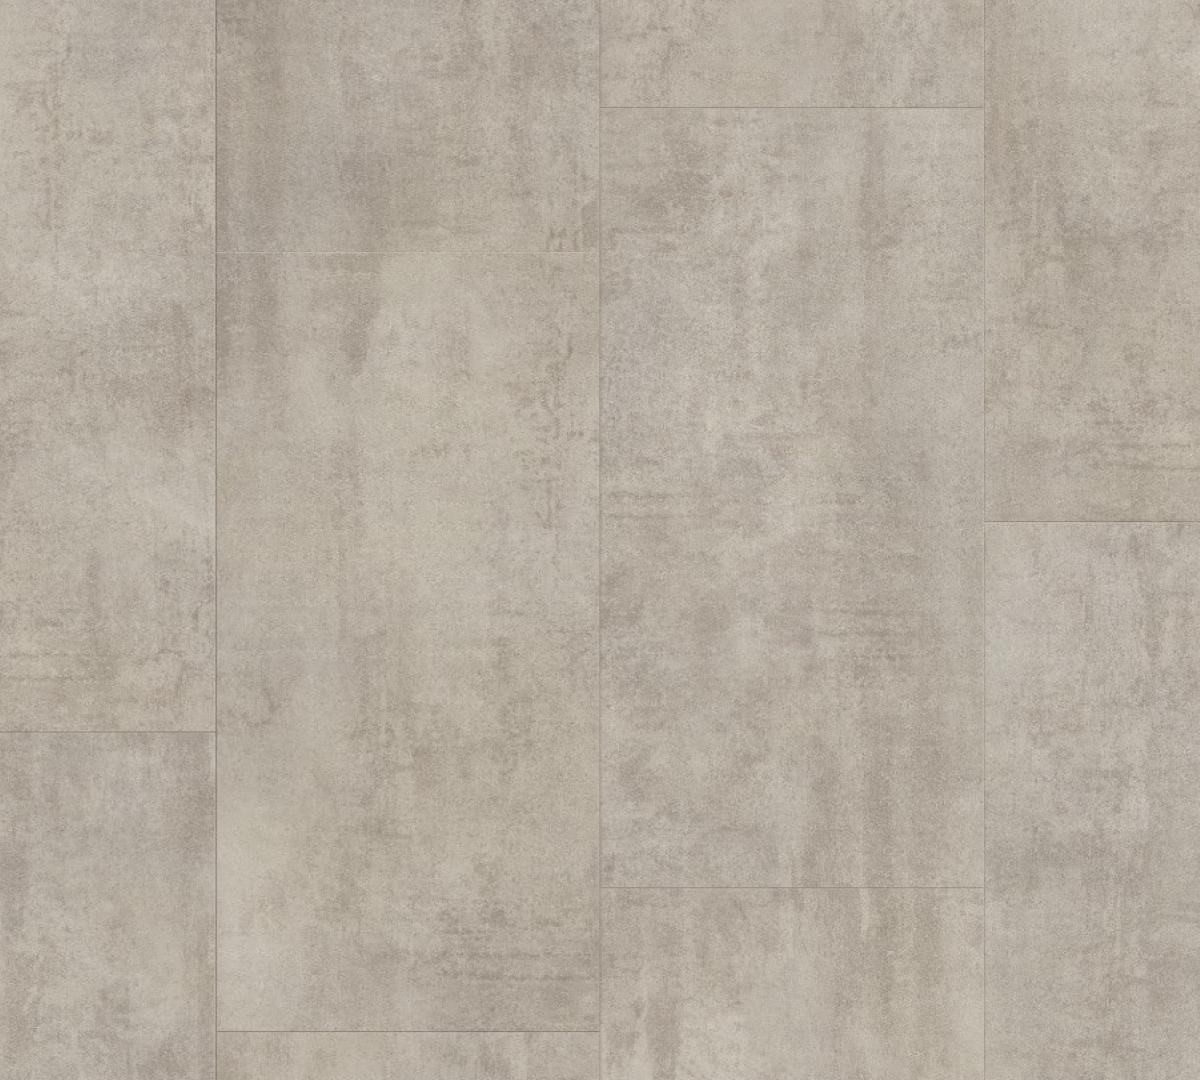 Кварцвиниловая плитка Pergo Optimum Classic Tile Glue v3218-40047 Травертин Светло-Серый (1305*327*2,5)